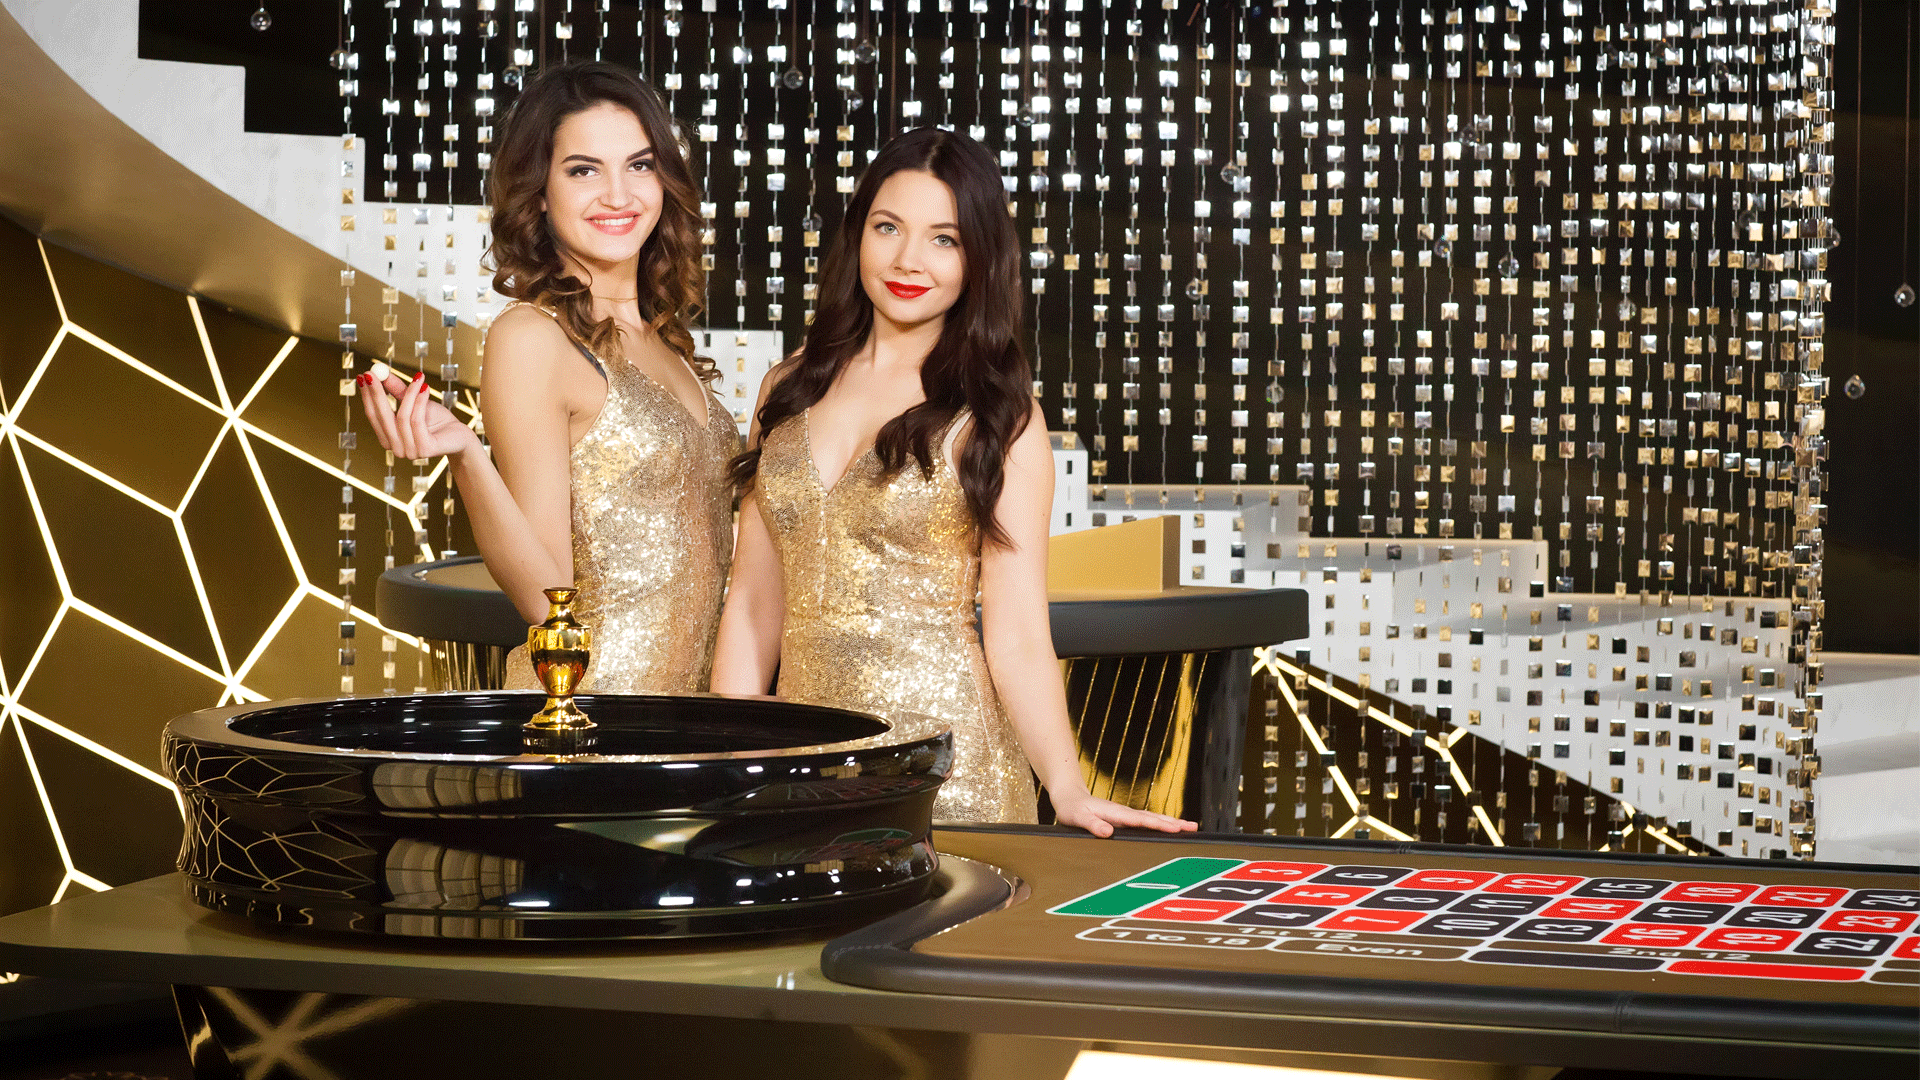 Online Casino Games - Glam Ladies Rock